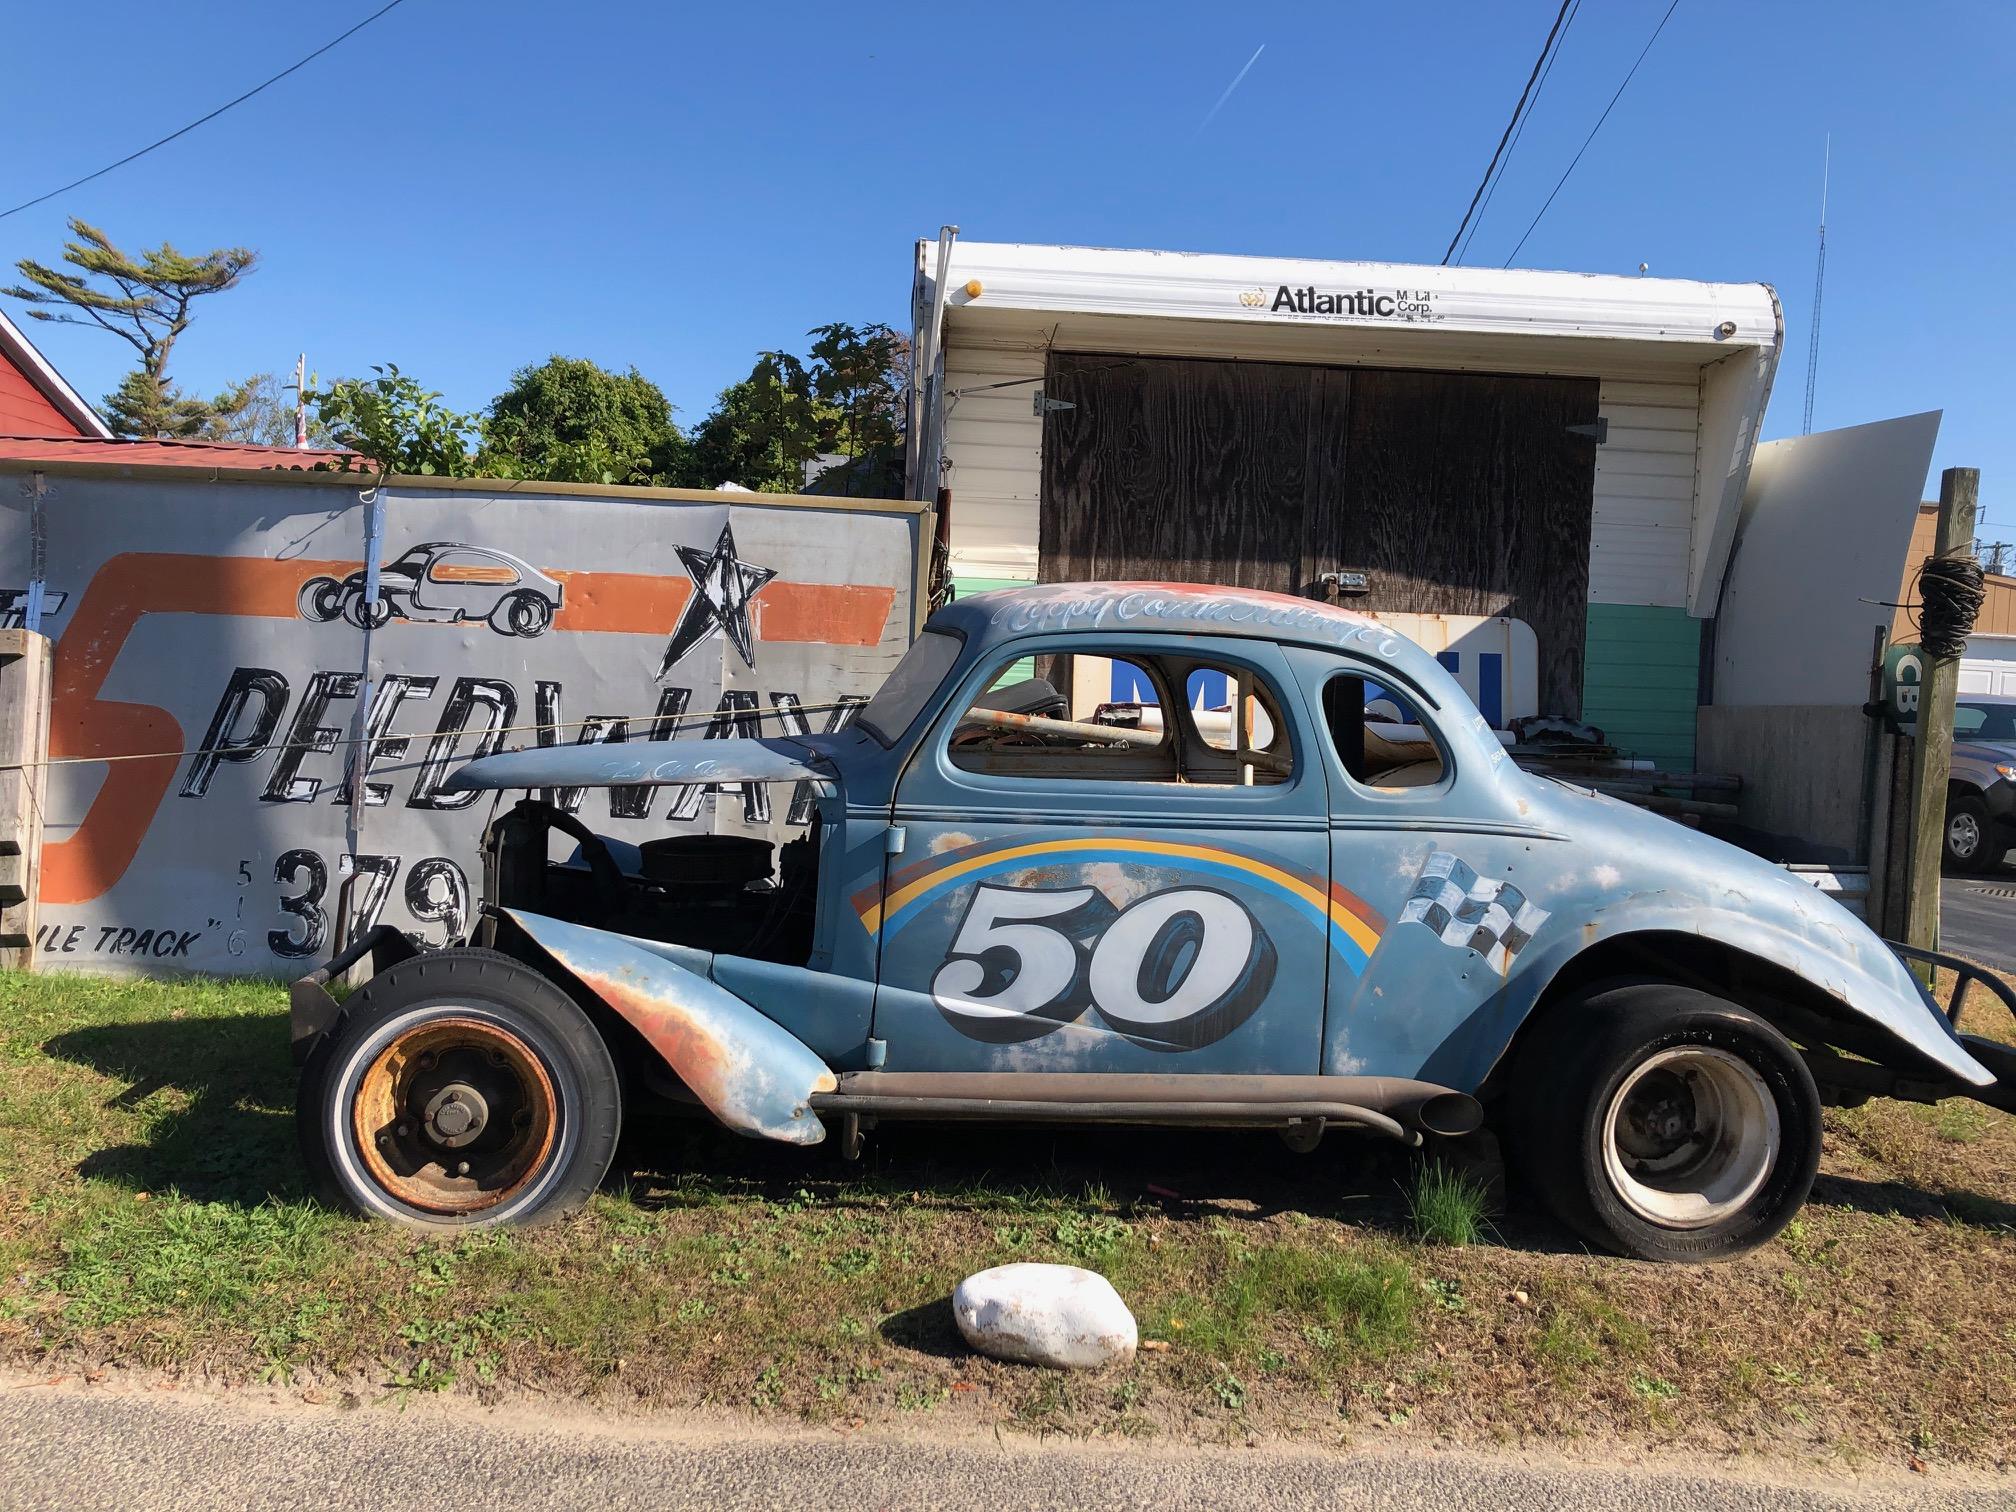 Himes Museum race car side profile